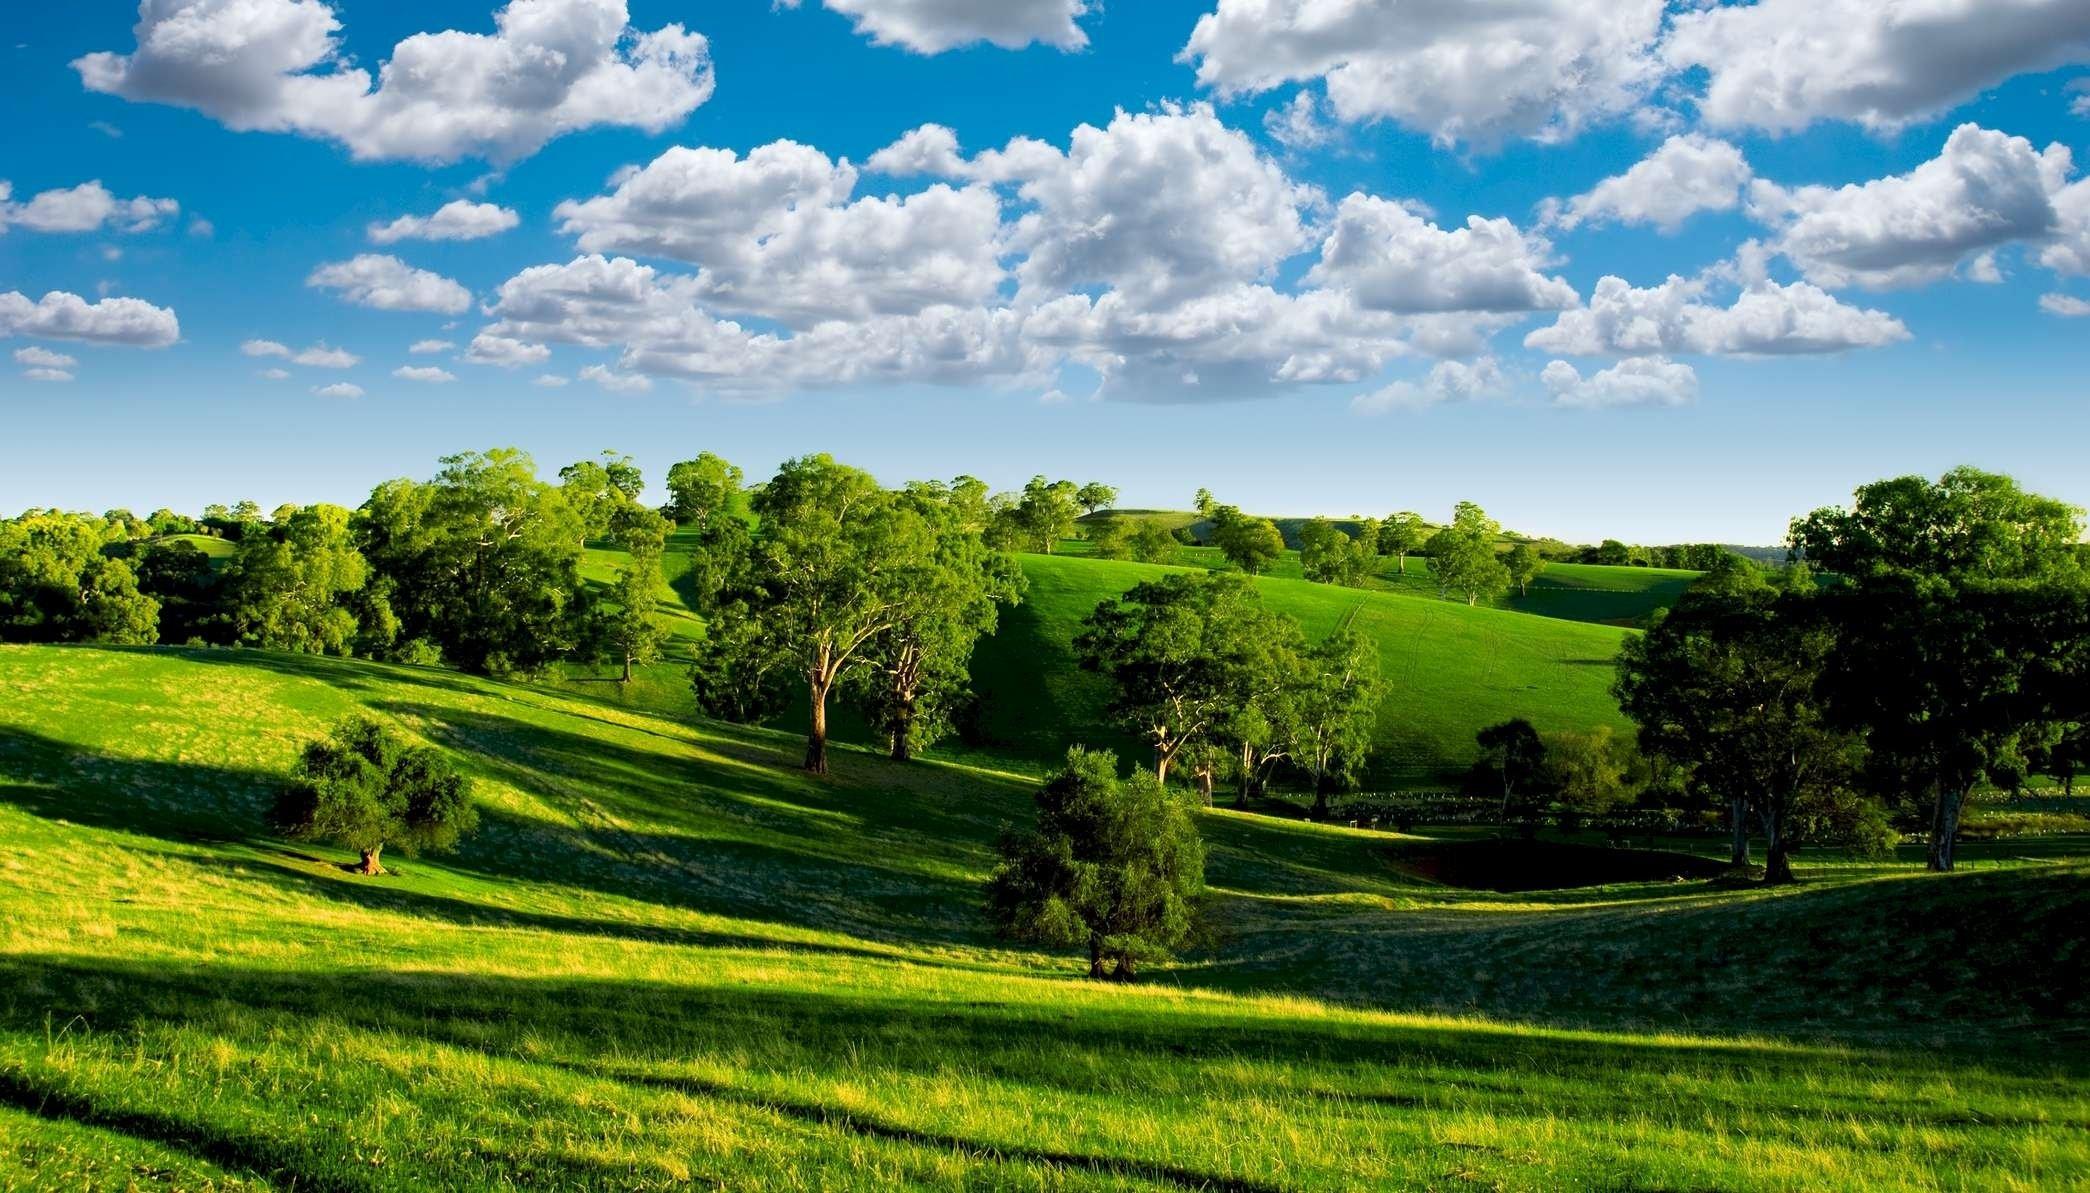 природа поле деревья облака горизонт nature field trees clouds horizon бесплатно